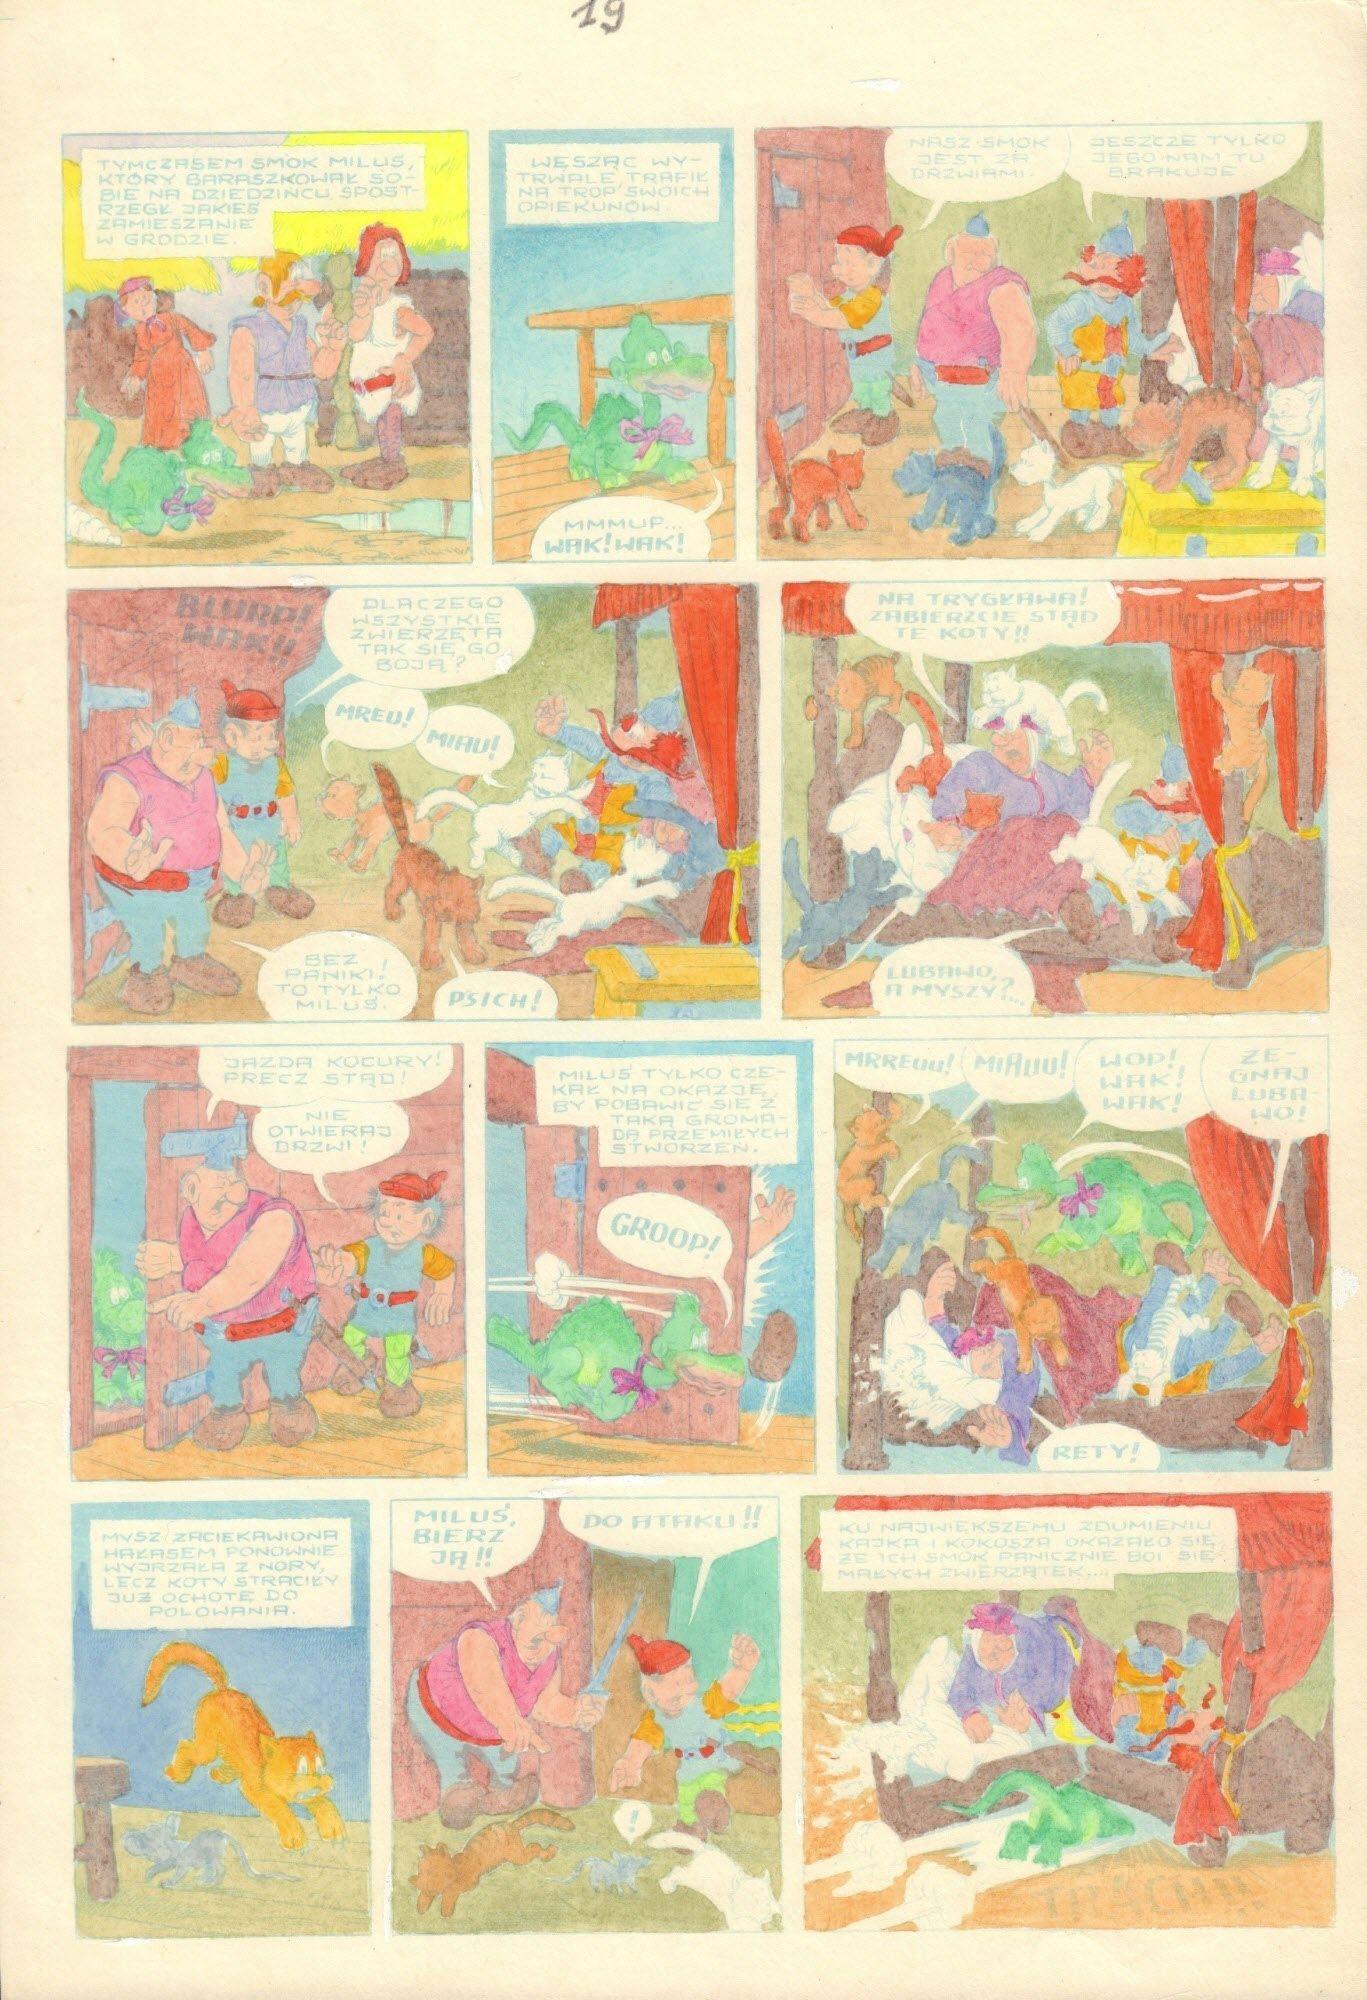 Zamach na Milusia, s. 19 - kolor